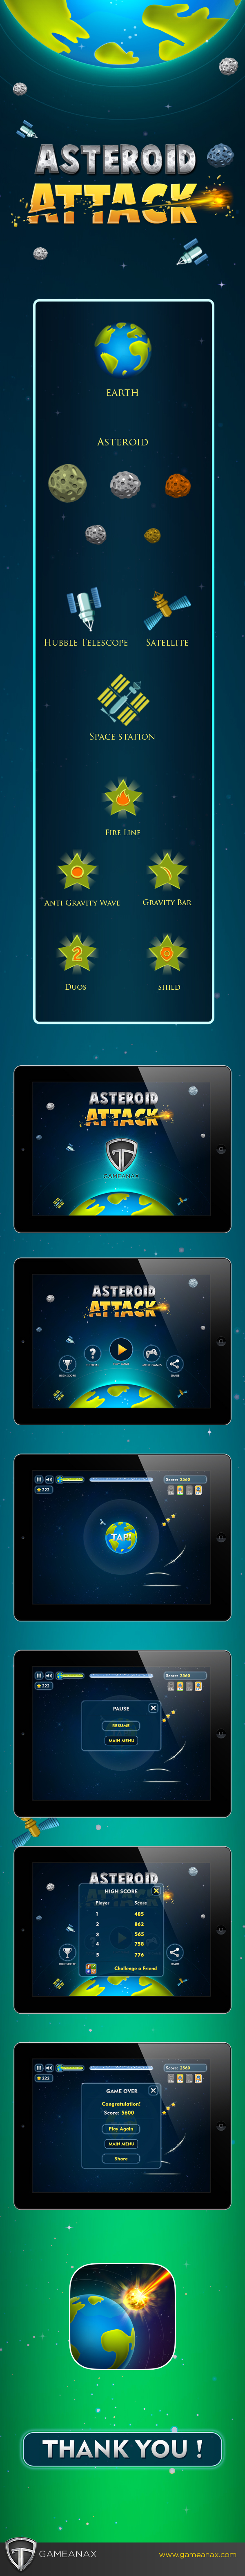 mobile gaming Gaming iphone iPad Games